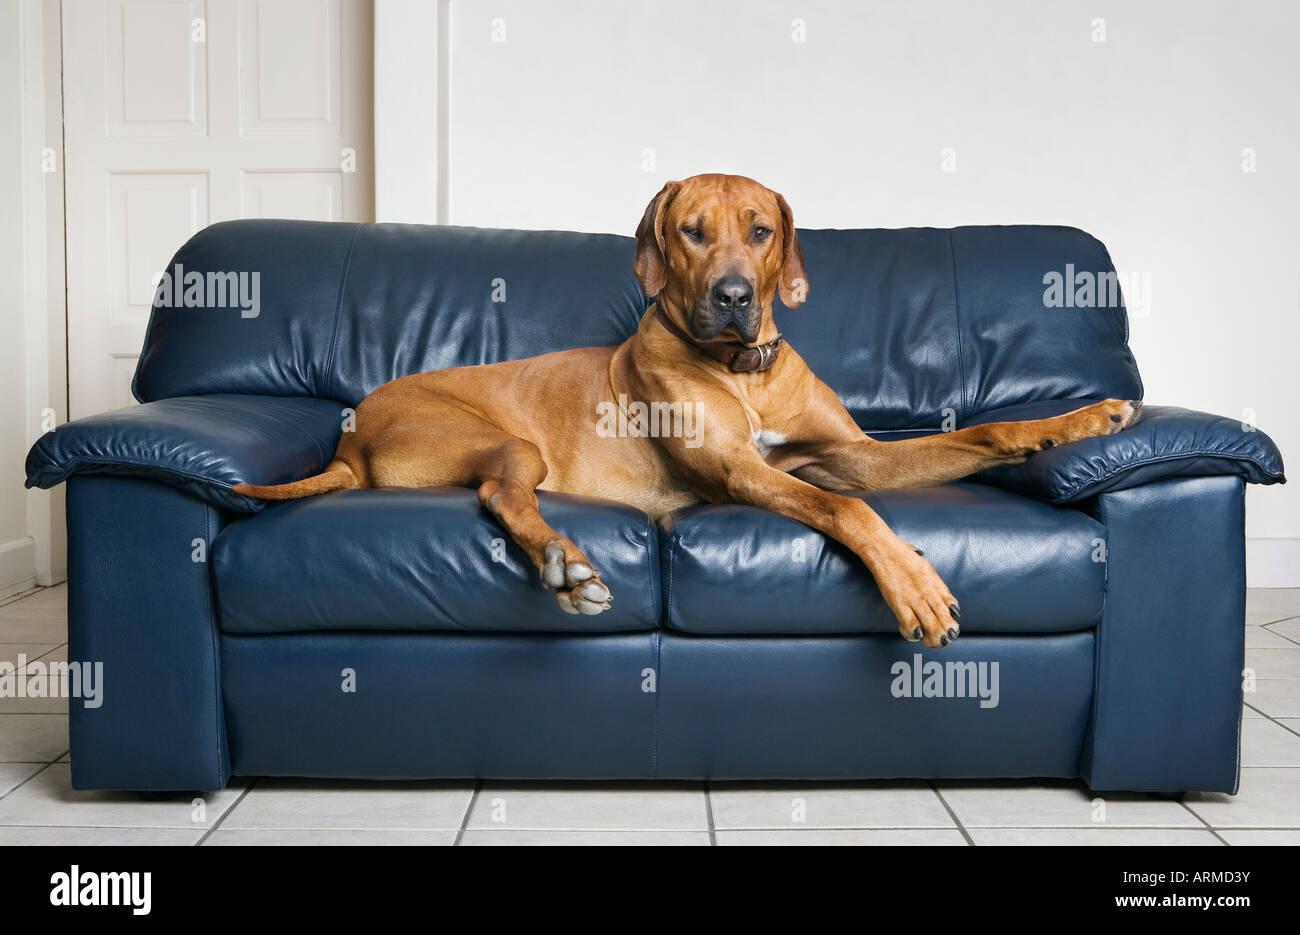 Rhodesian Ridge back dog lying on sofa - Stock Image